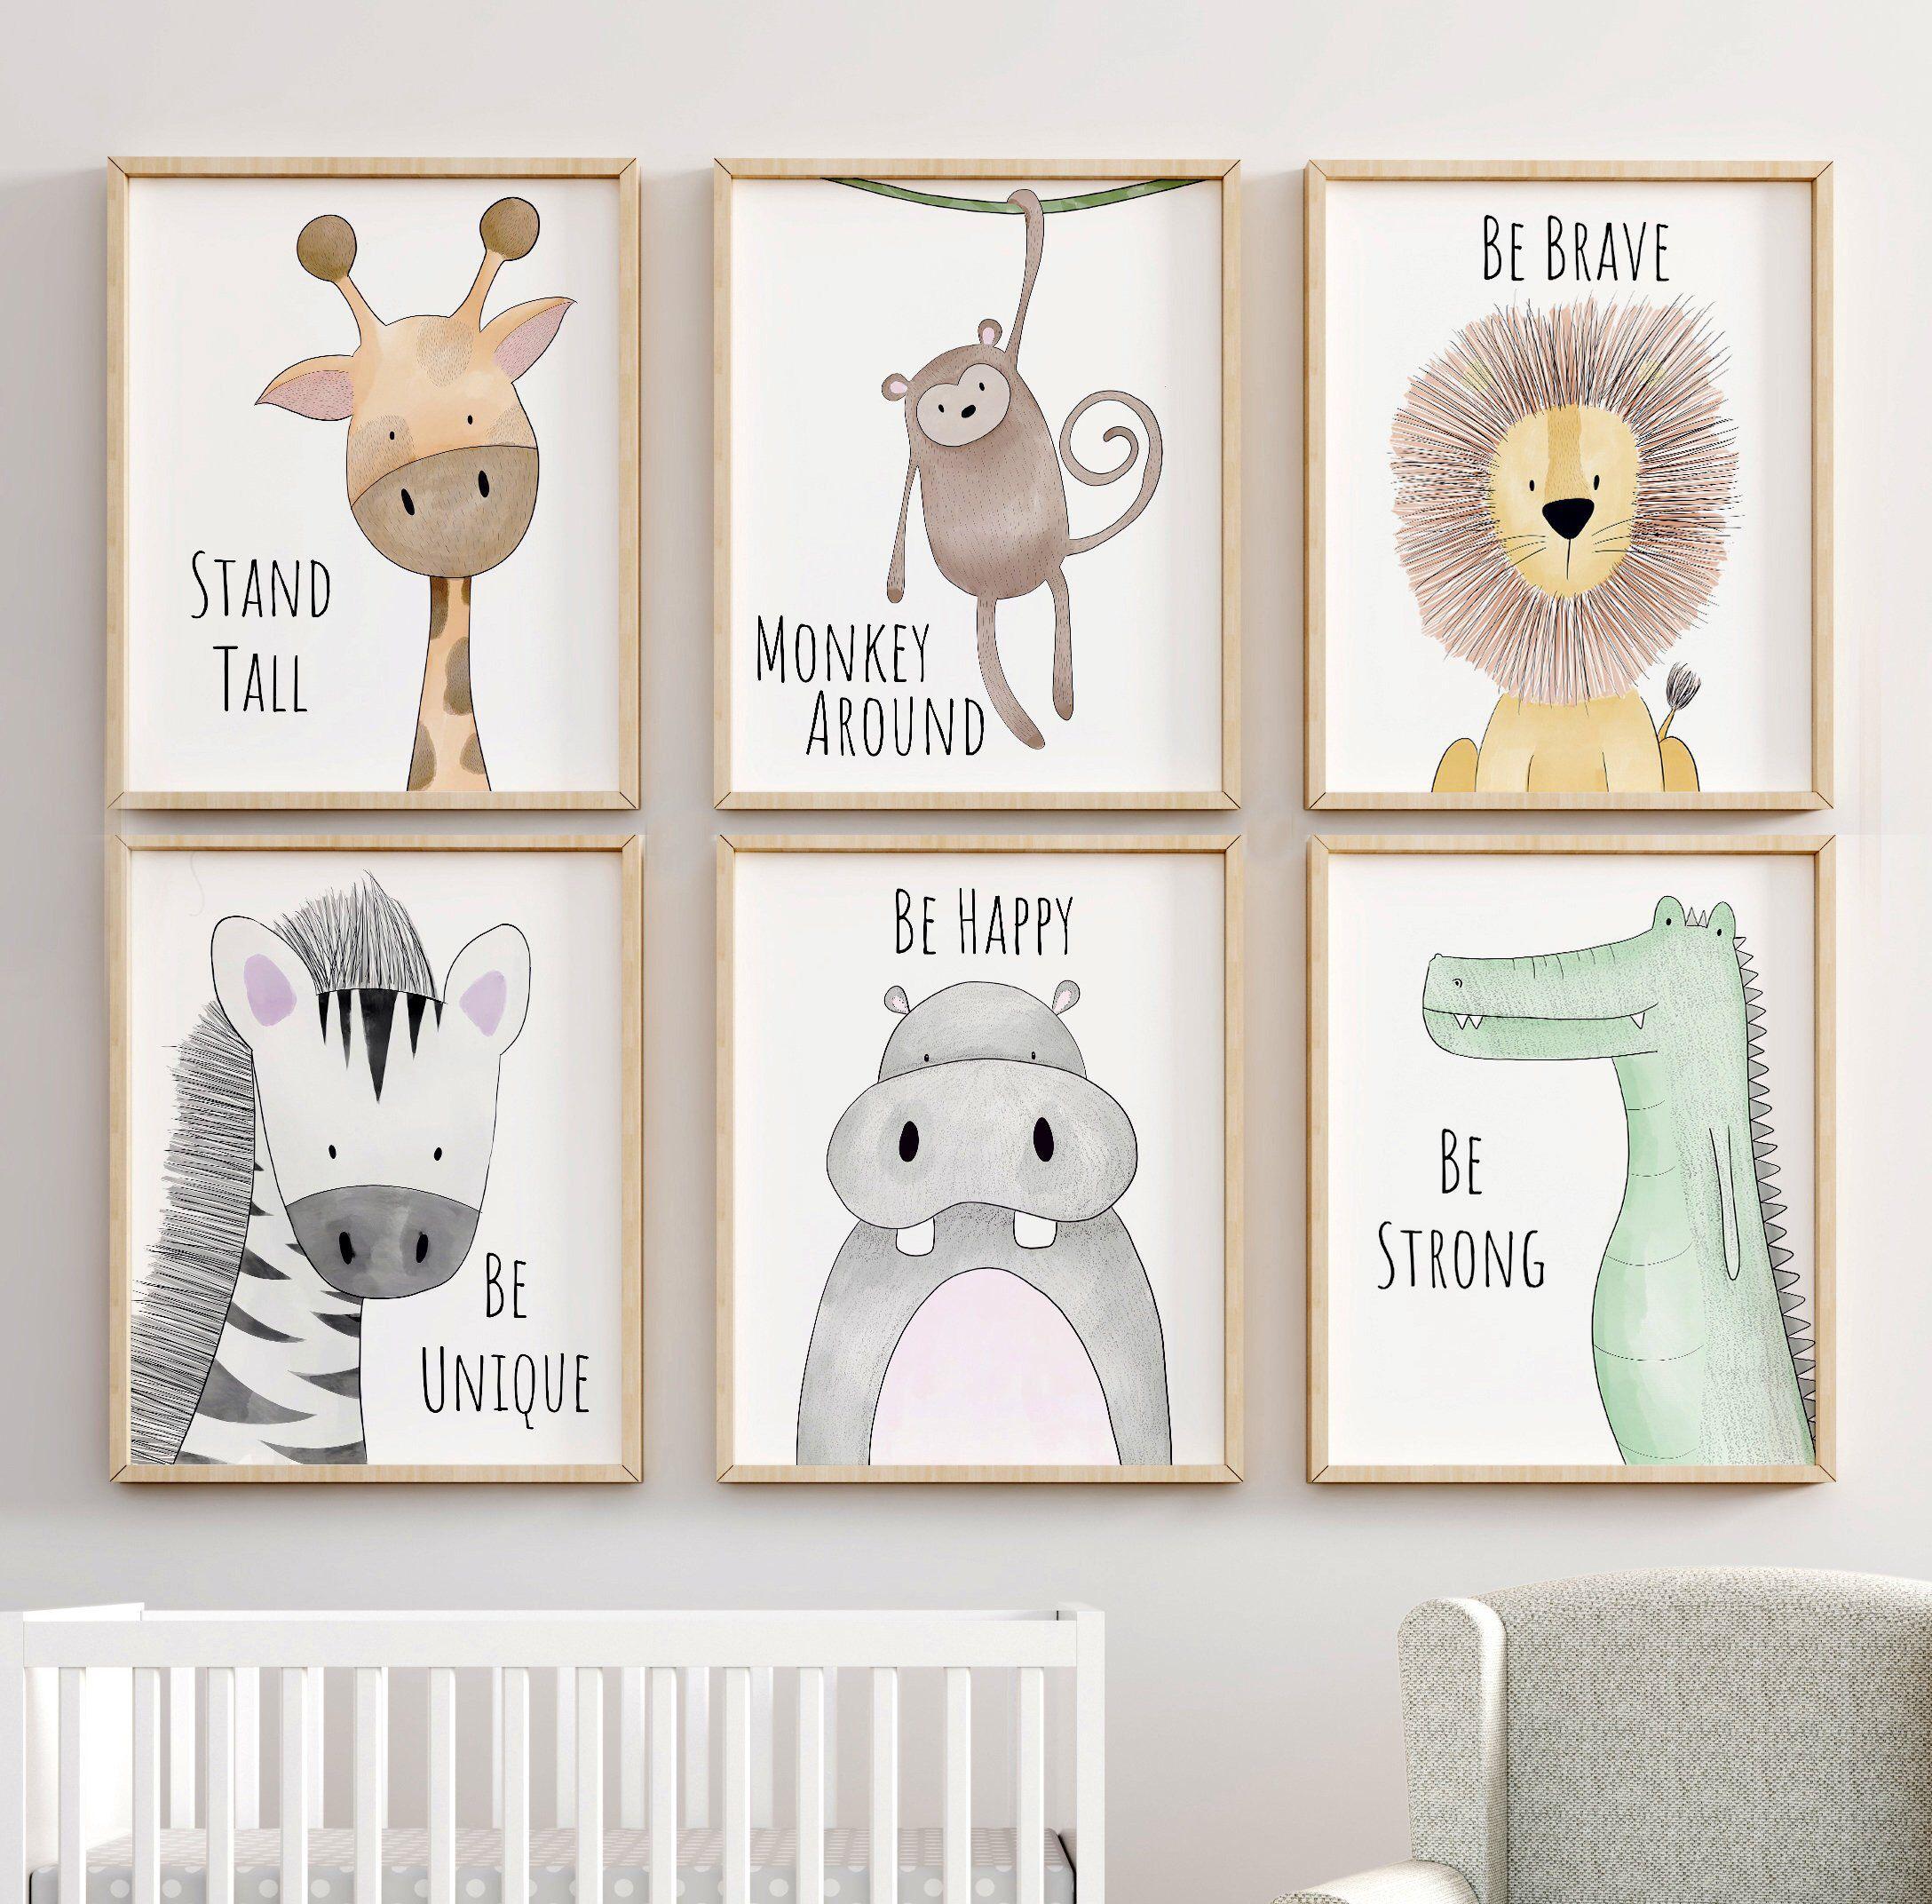 Safari Nursery Decor, Animal Nursery Prints, Quote Nursery Print, Peekaboo Nursery, Safari Animal, Safari Nursery, Neutral Nursery Prints